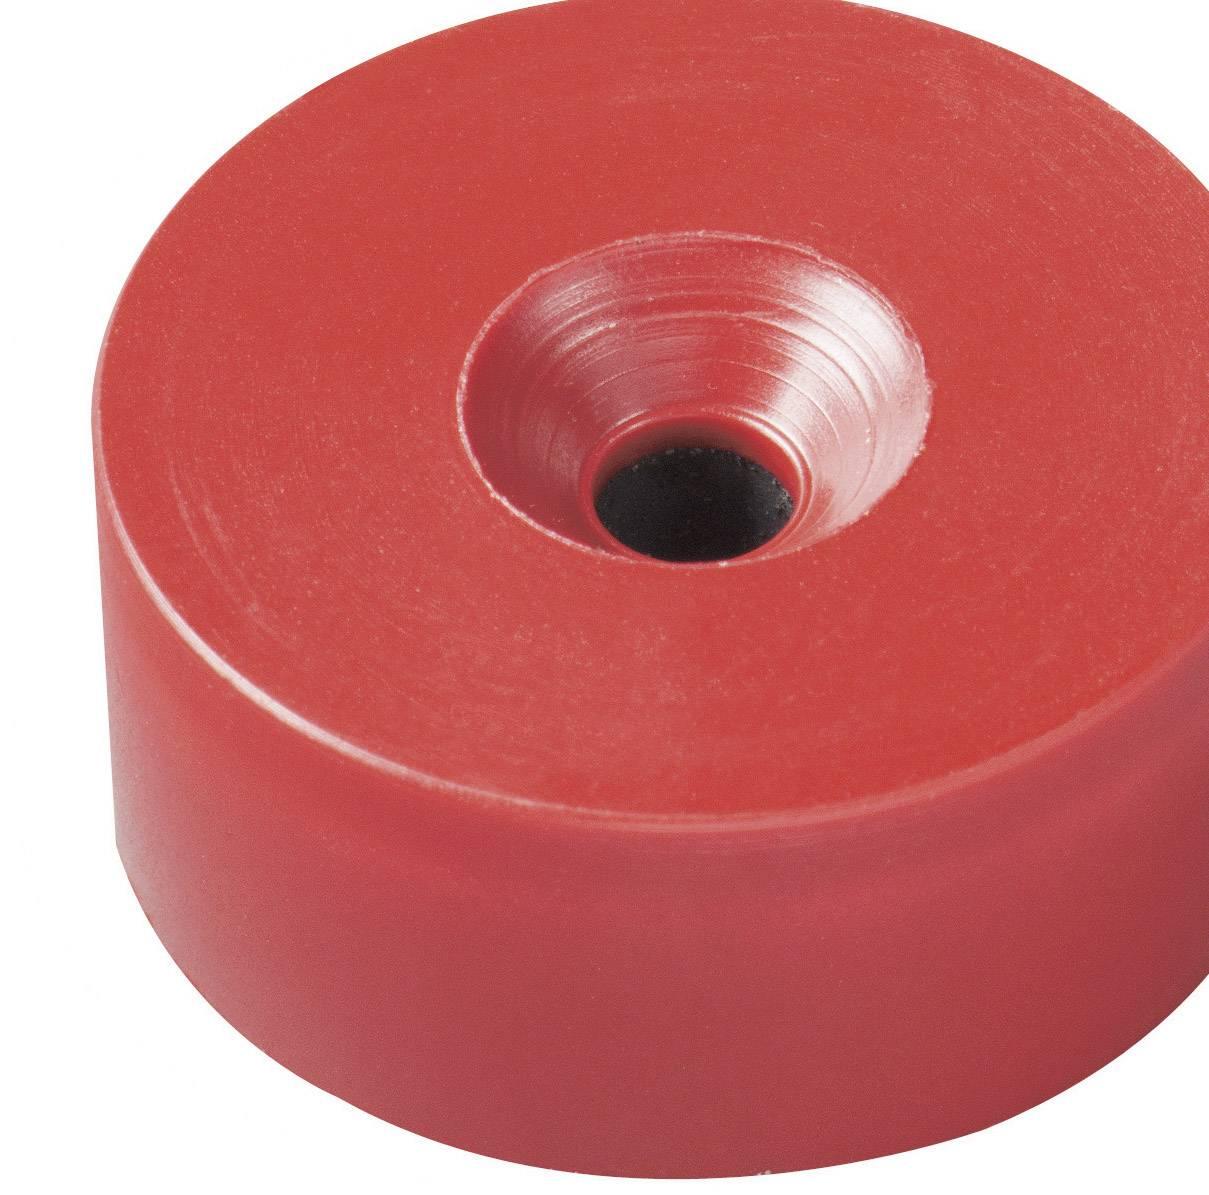 Permanentný magnet kruh Elobau 300780, (Ø x v) 26 mm x 11 mm, BaO